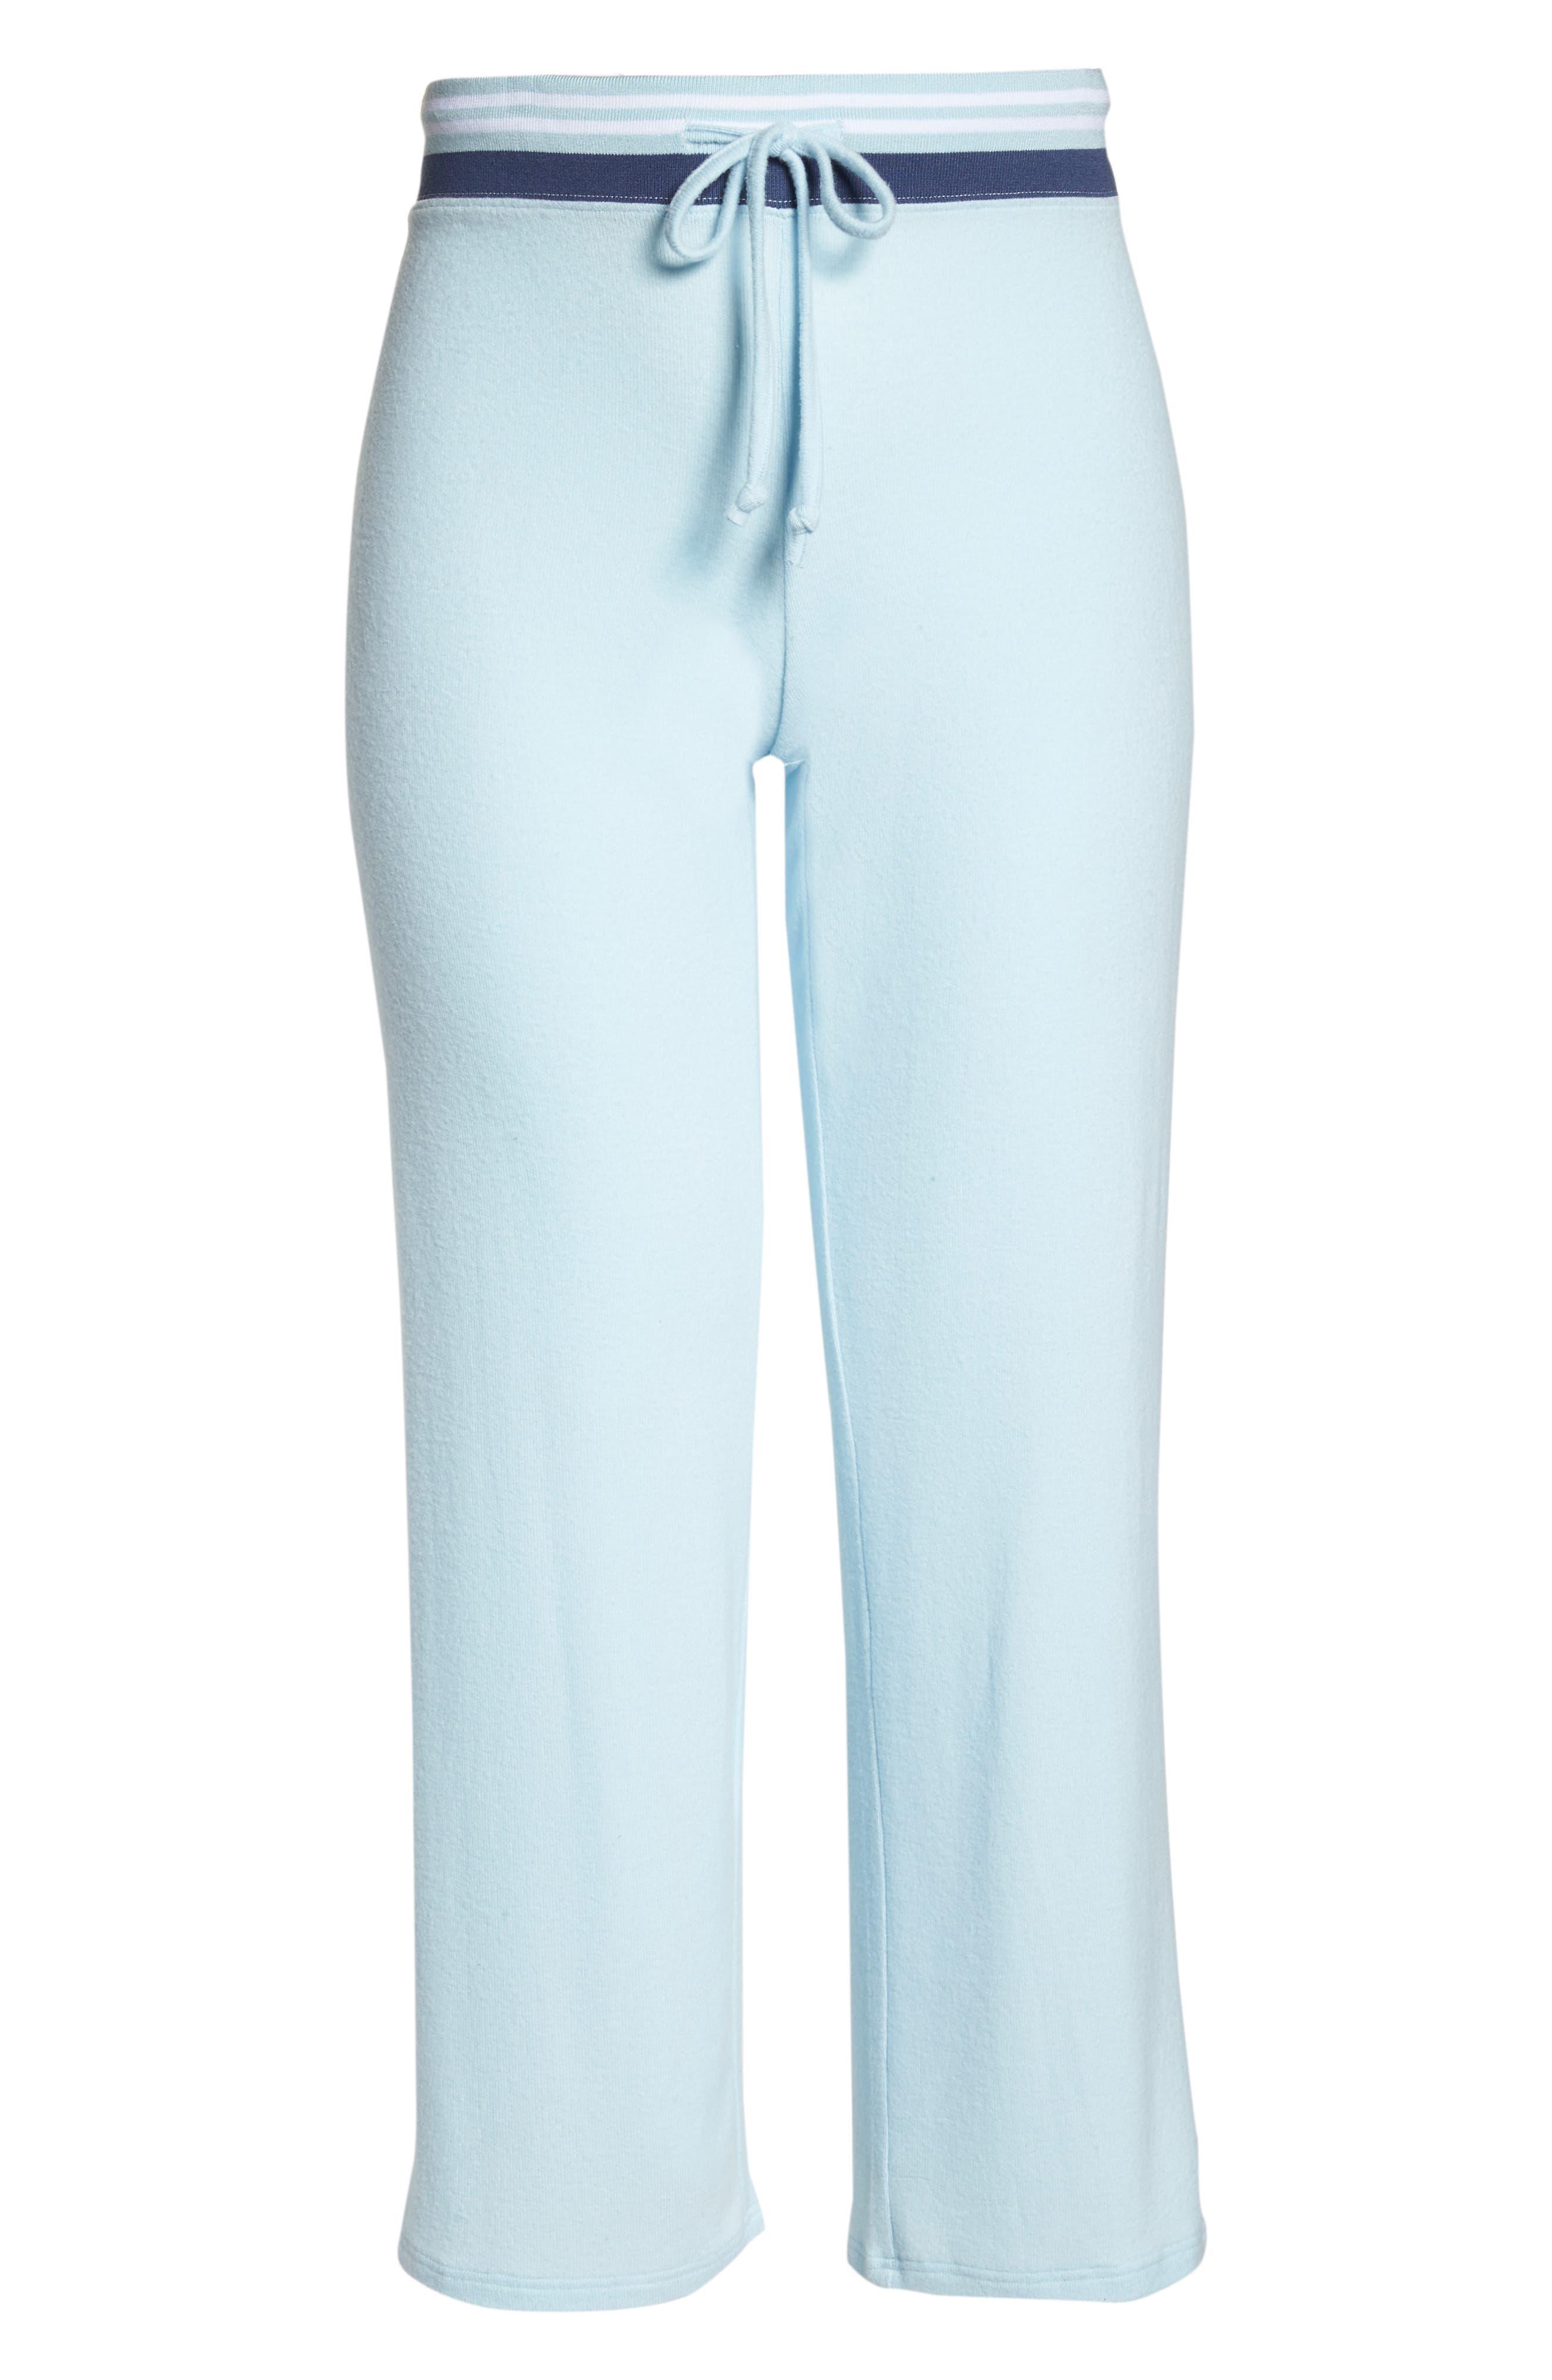 'Best Boyfriend' Brushed Hacci Lounge Pants,                             Alternate thumbnail 7, color,                             Blue Omphalodes